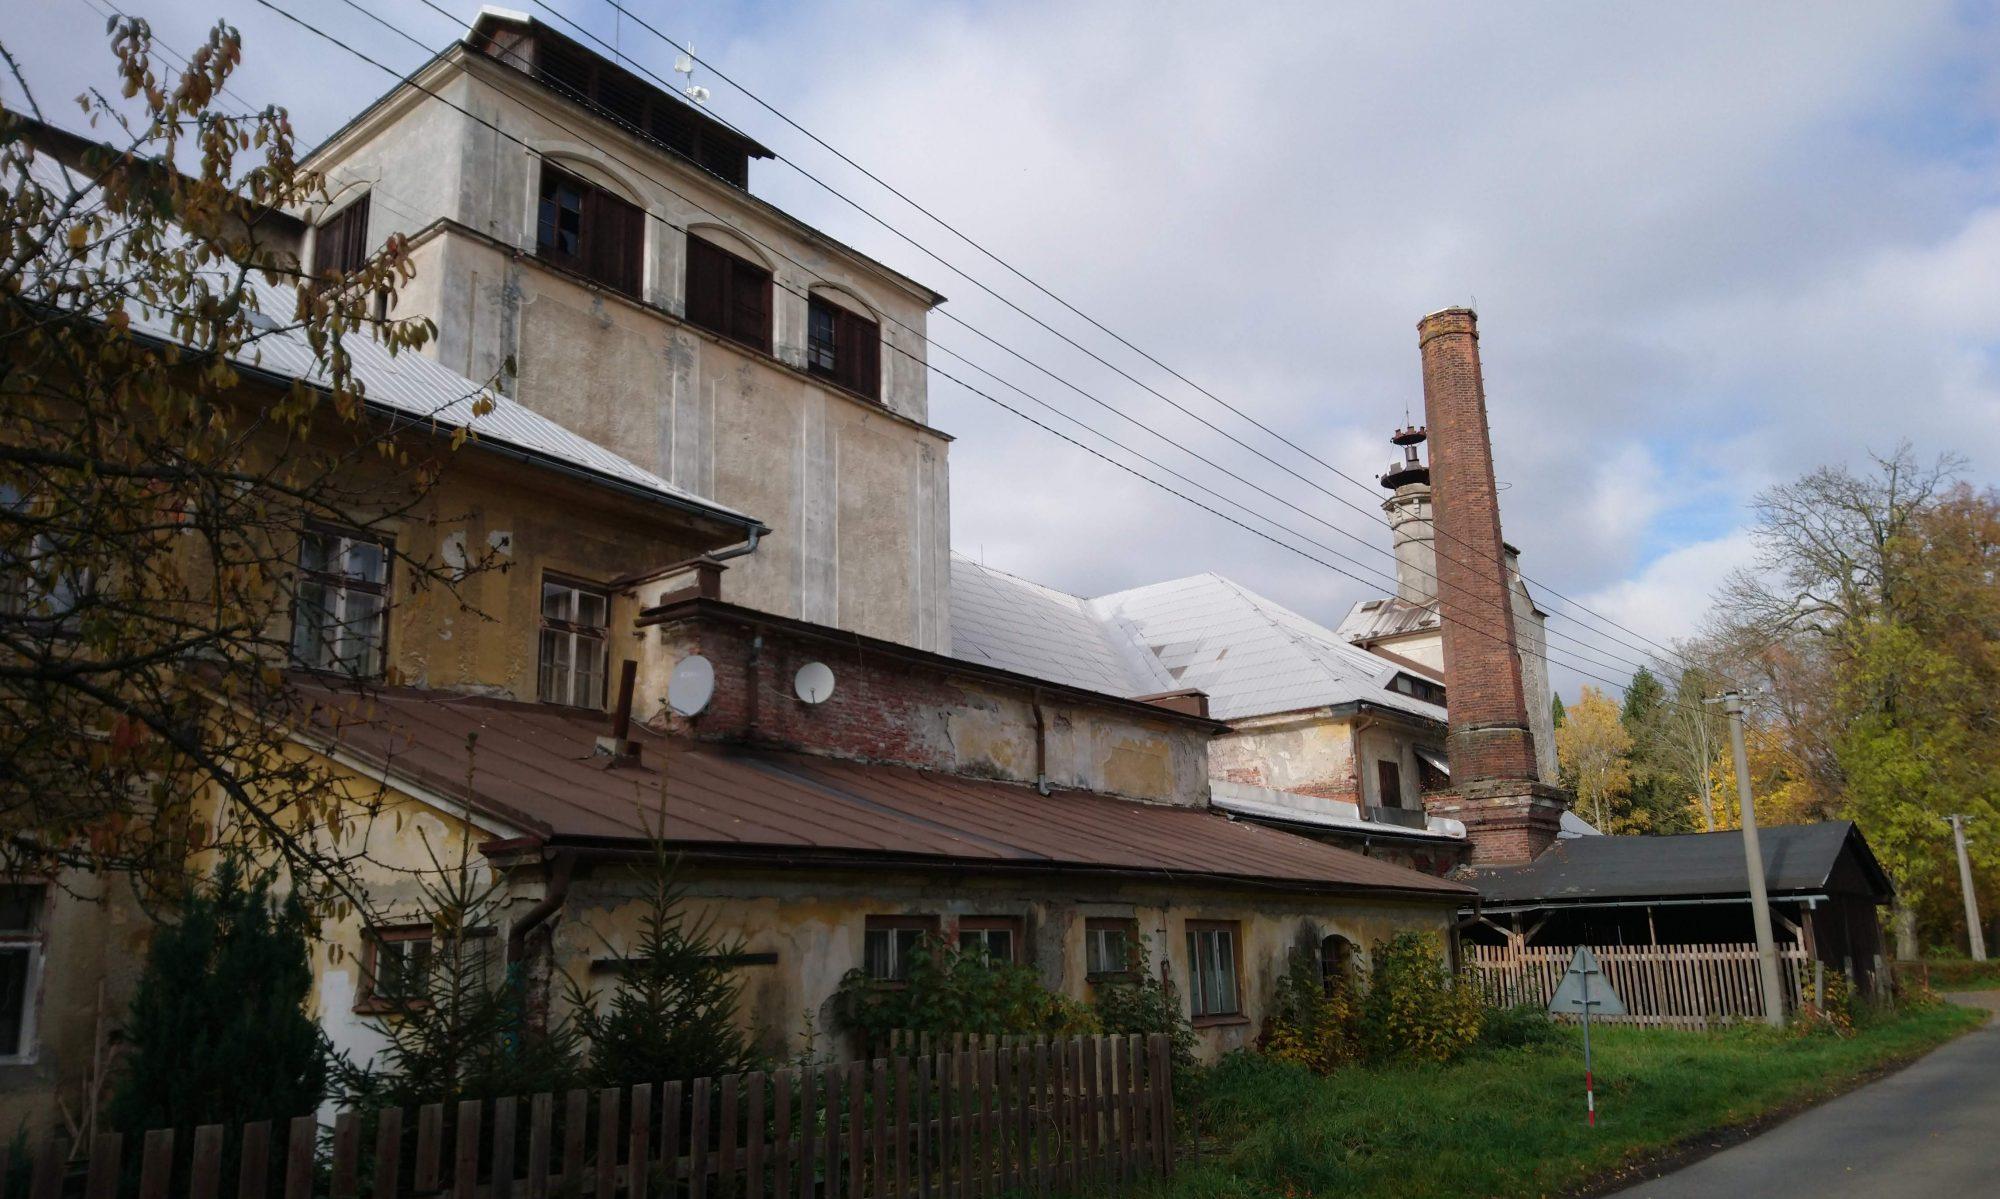 Pivovar Janovice